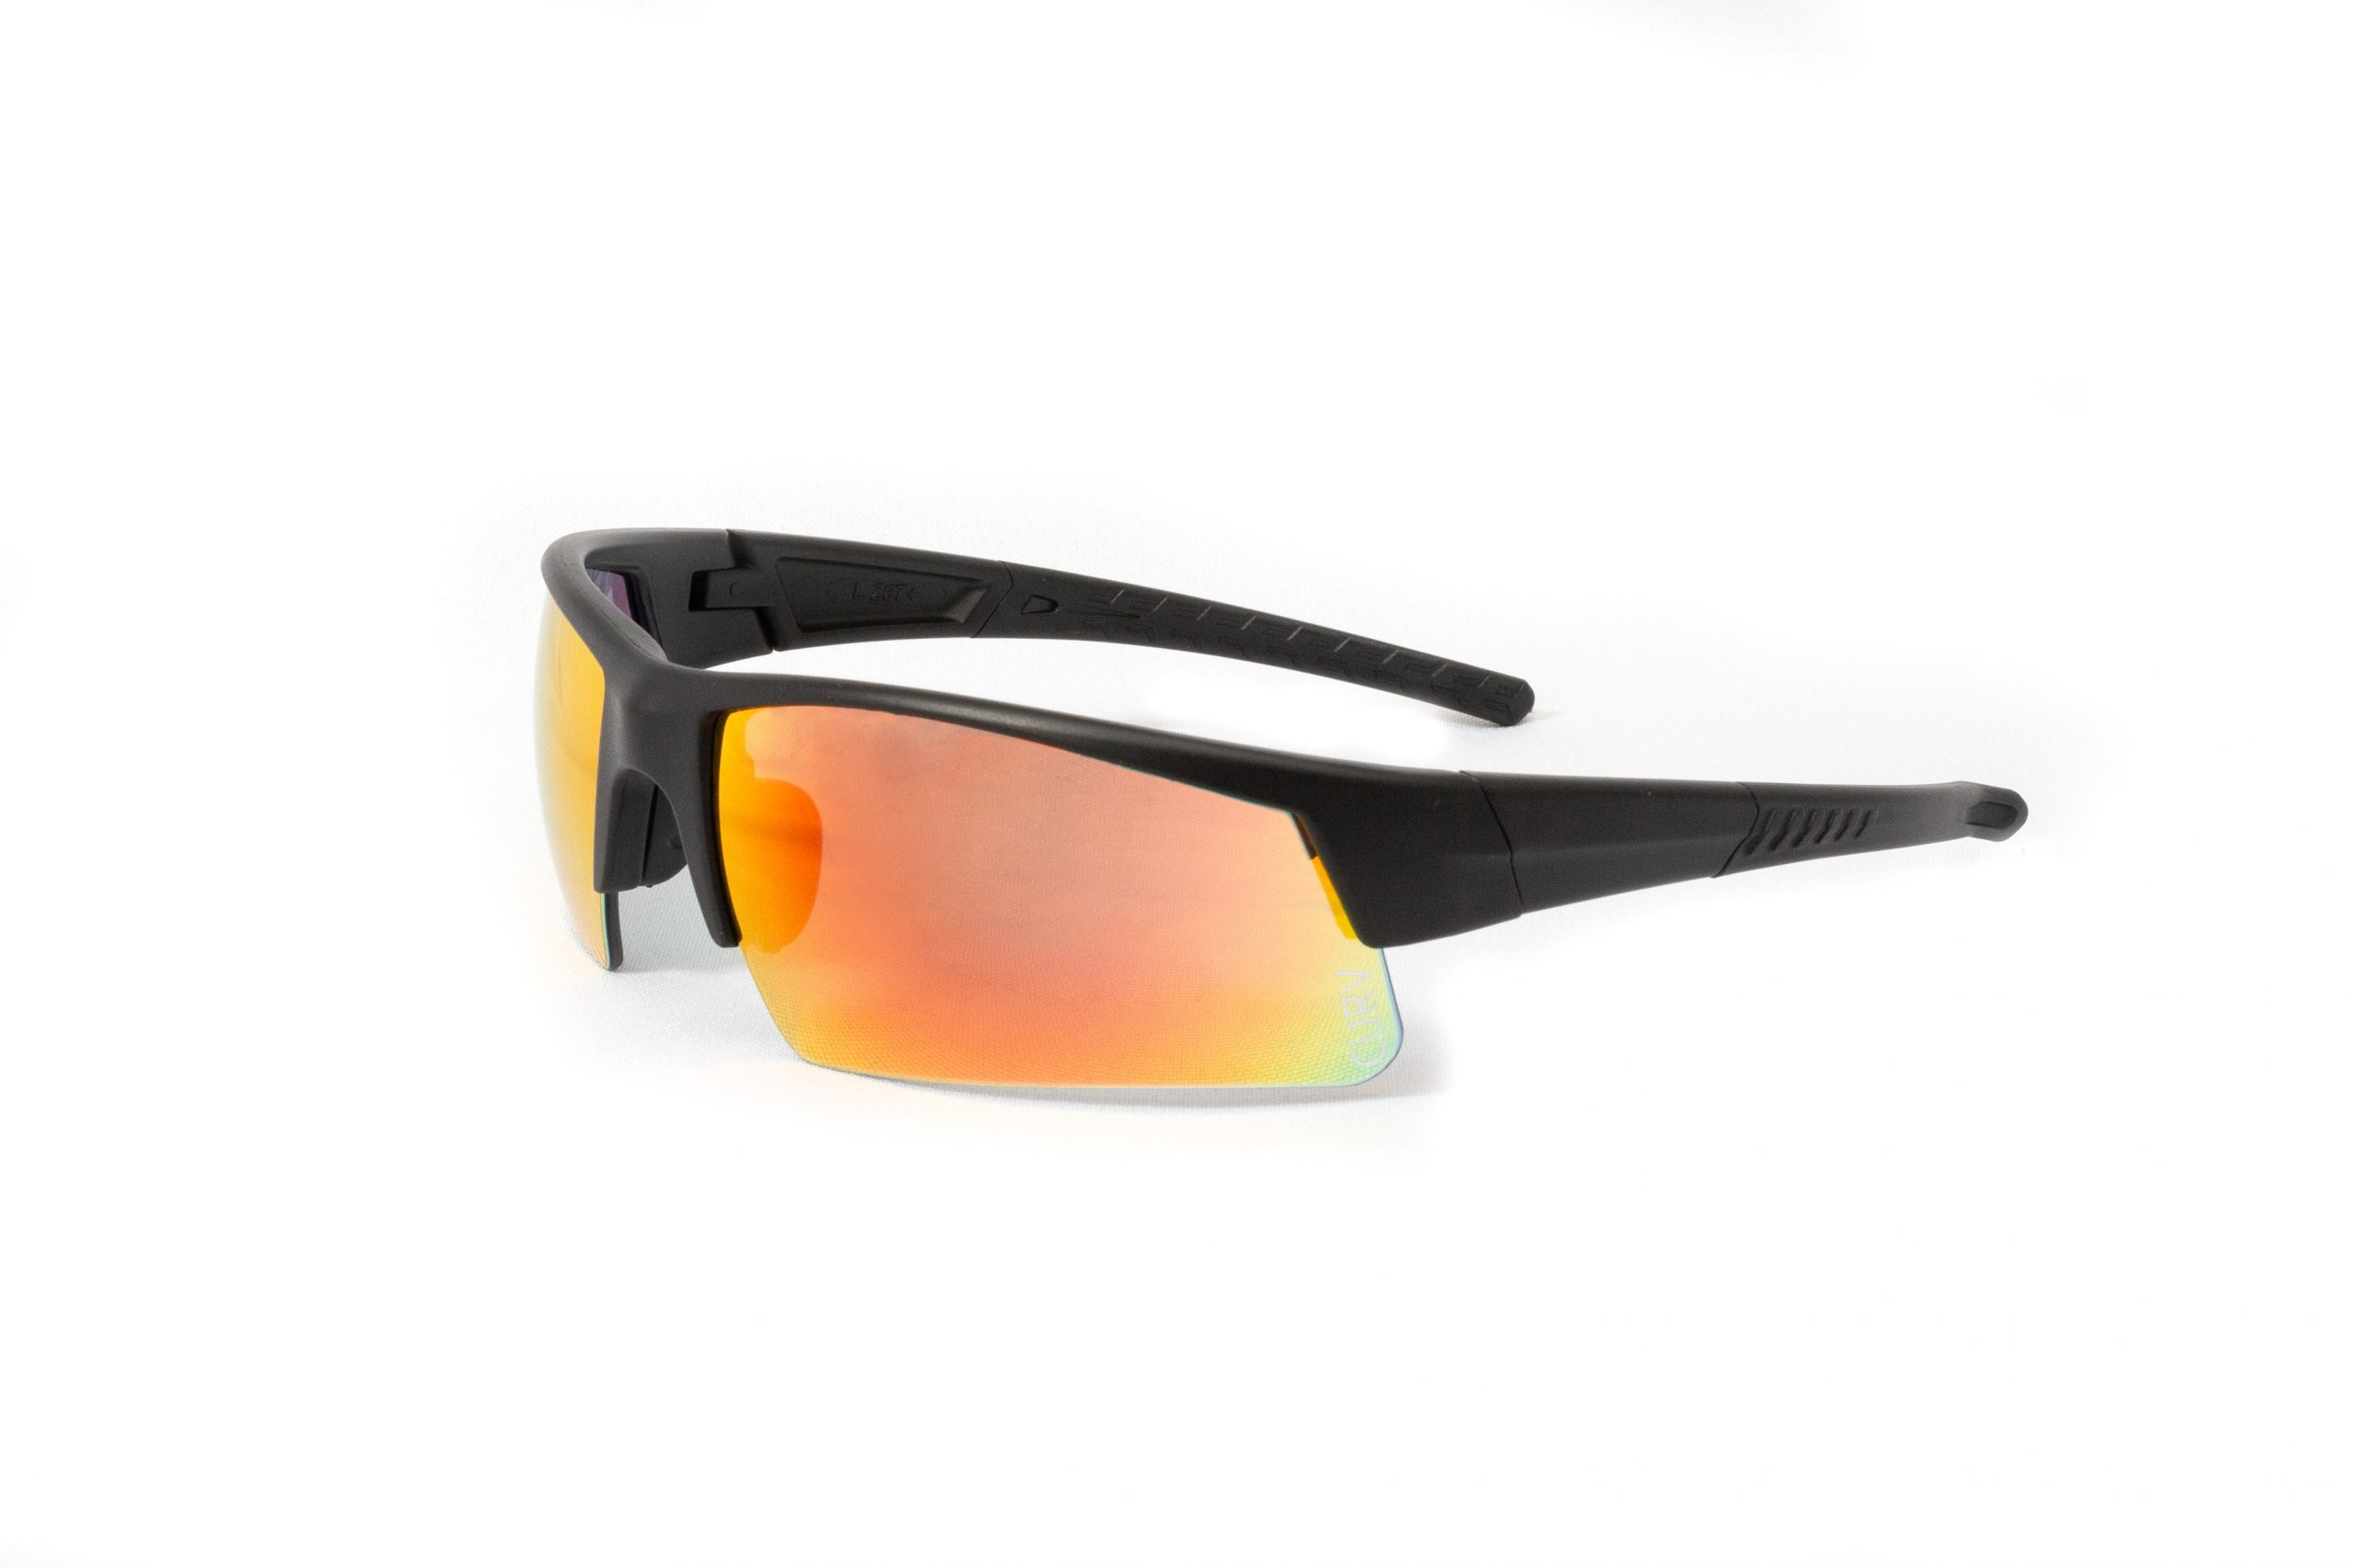 01-67 - Curv® - Matte Black Sport Frame with Half-Rim Red Mirror Lenses